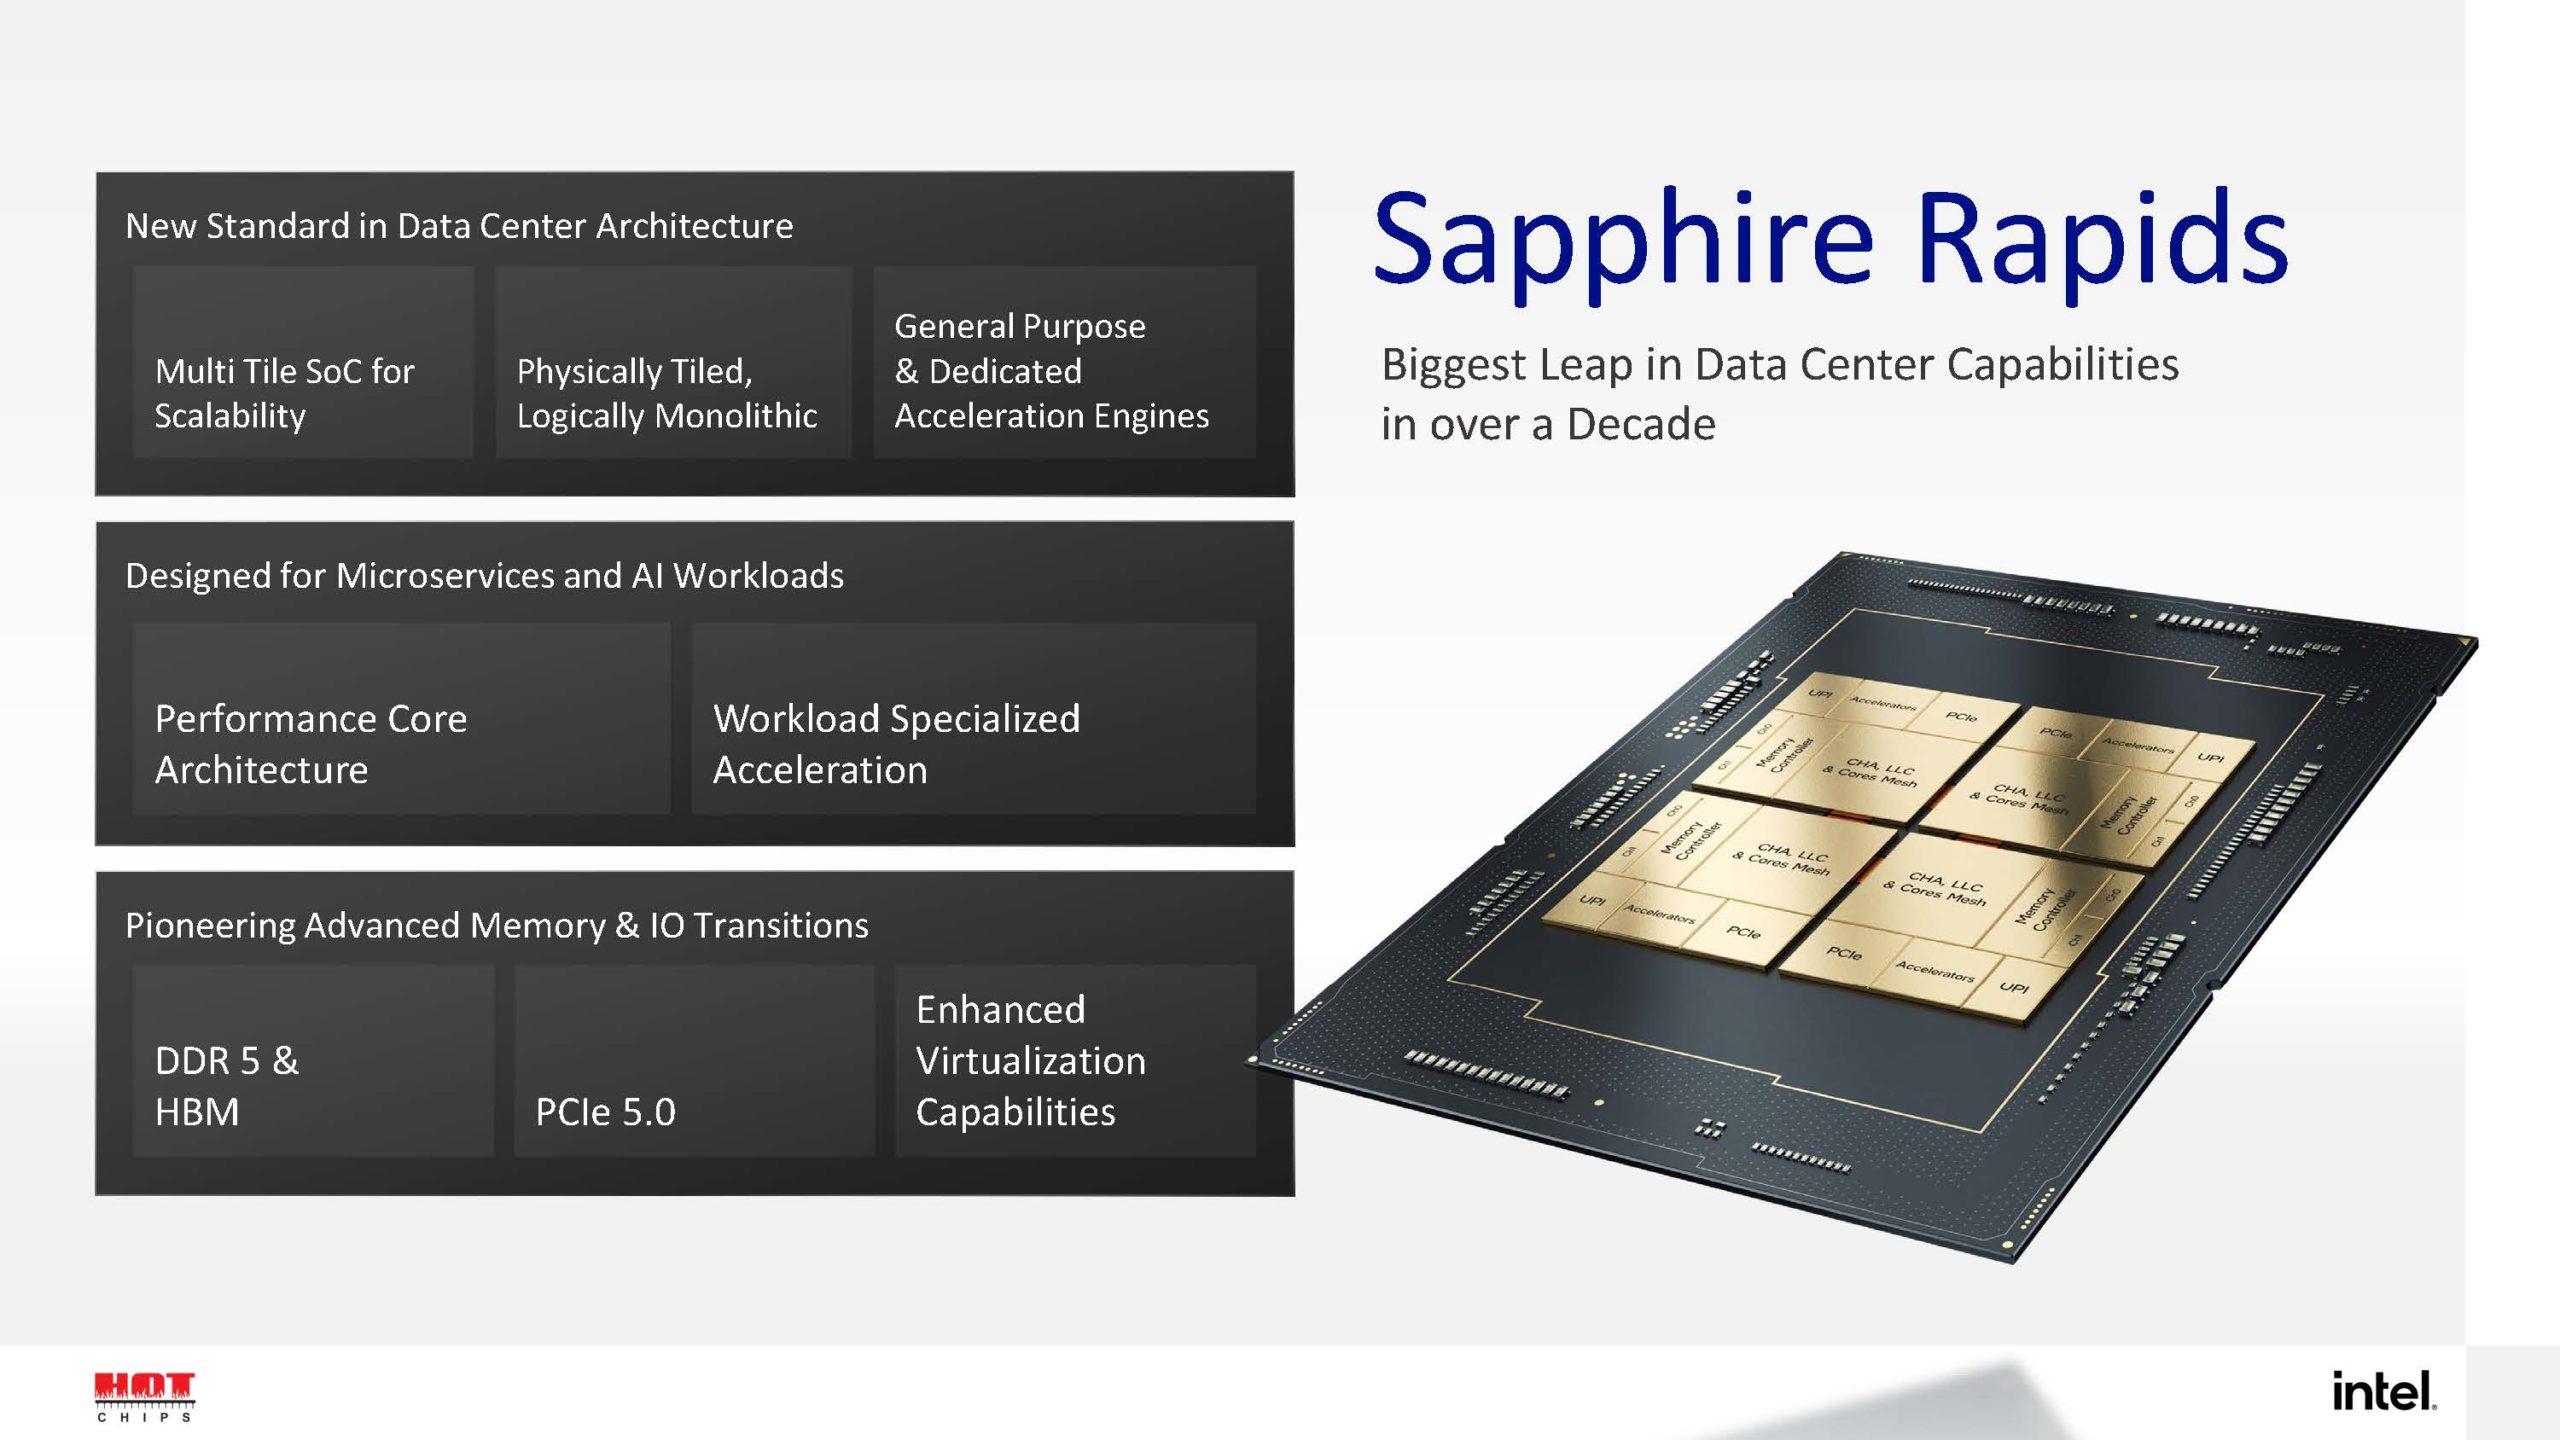 HC33 Intel Sapphire Rapids Summary